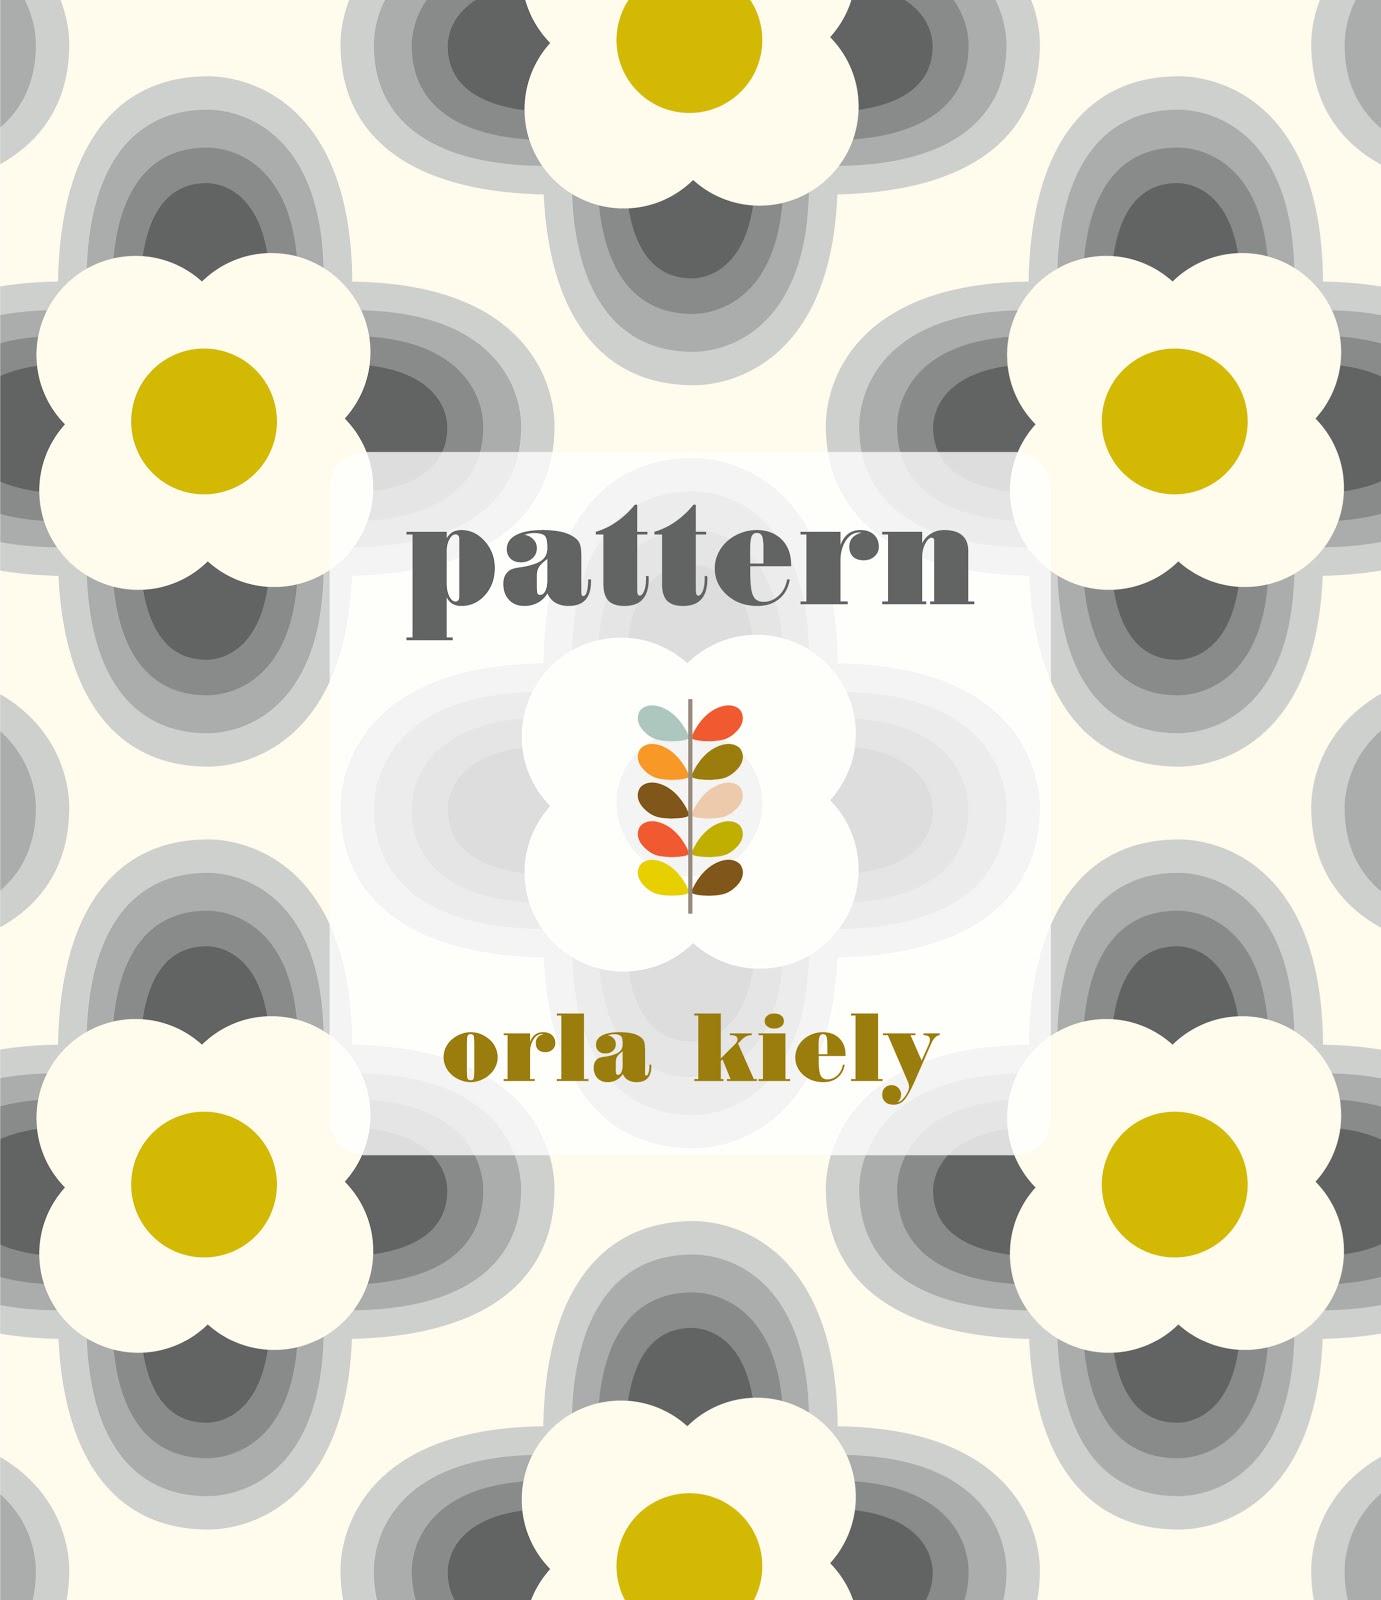 Paperfolk inspiring reads pattern by orla kiely